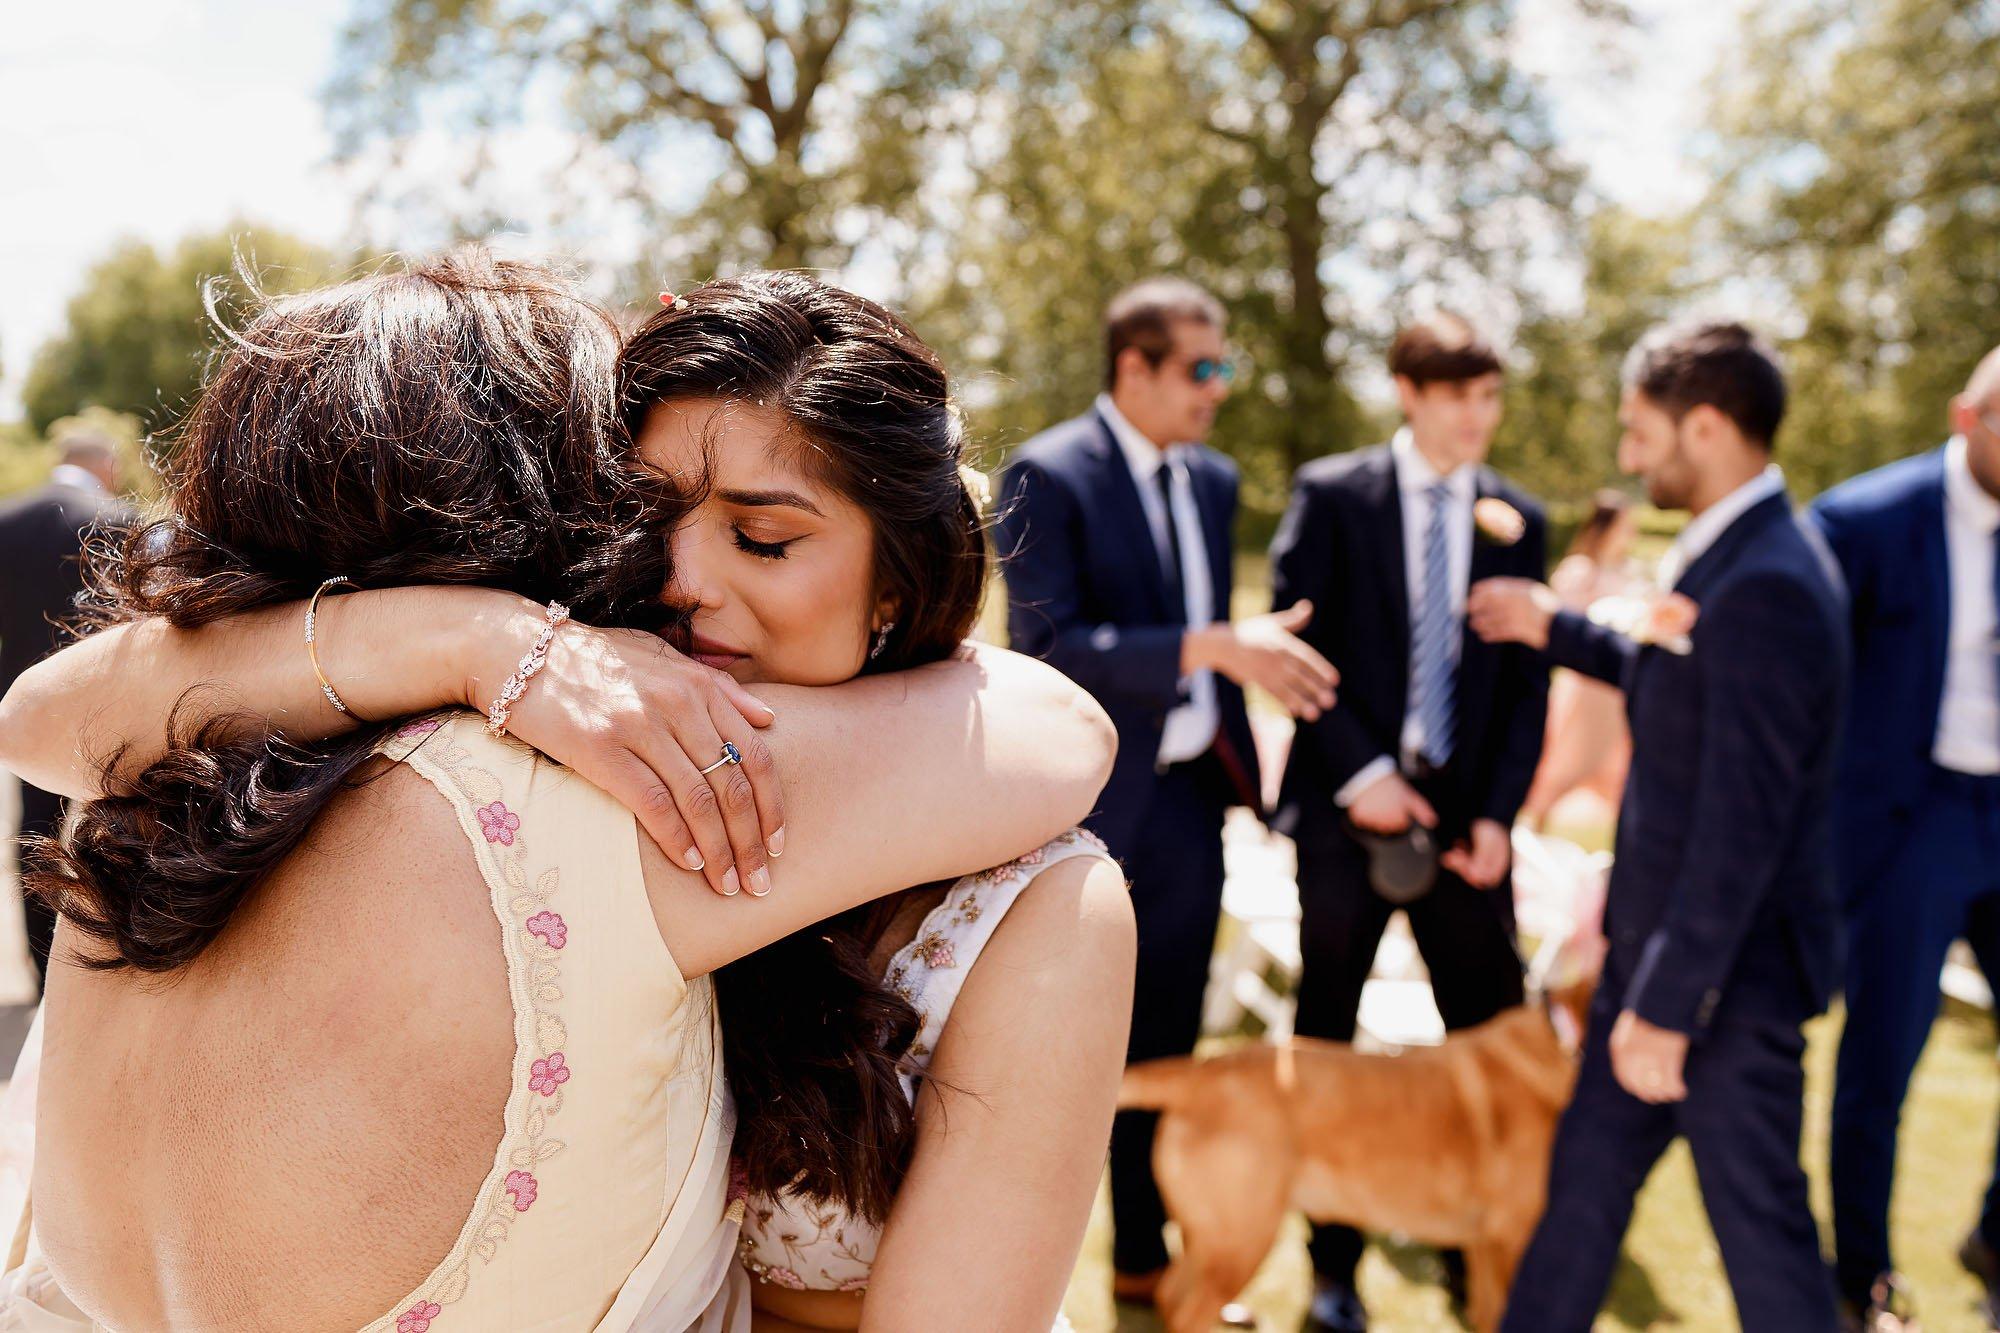 Bradbourne house kent wedding photography by arj photography®